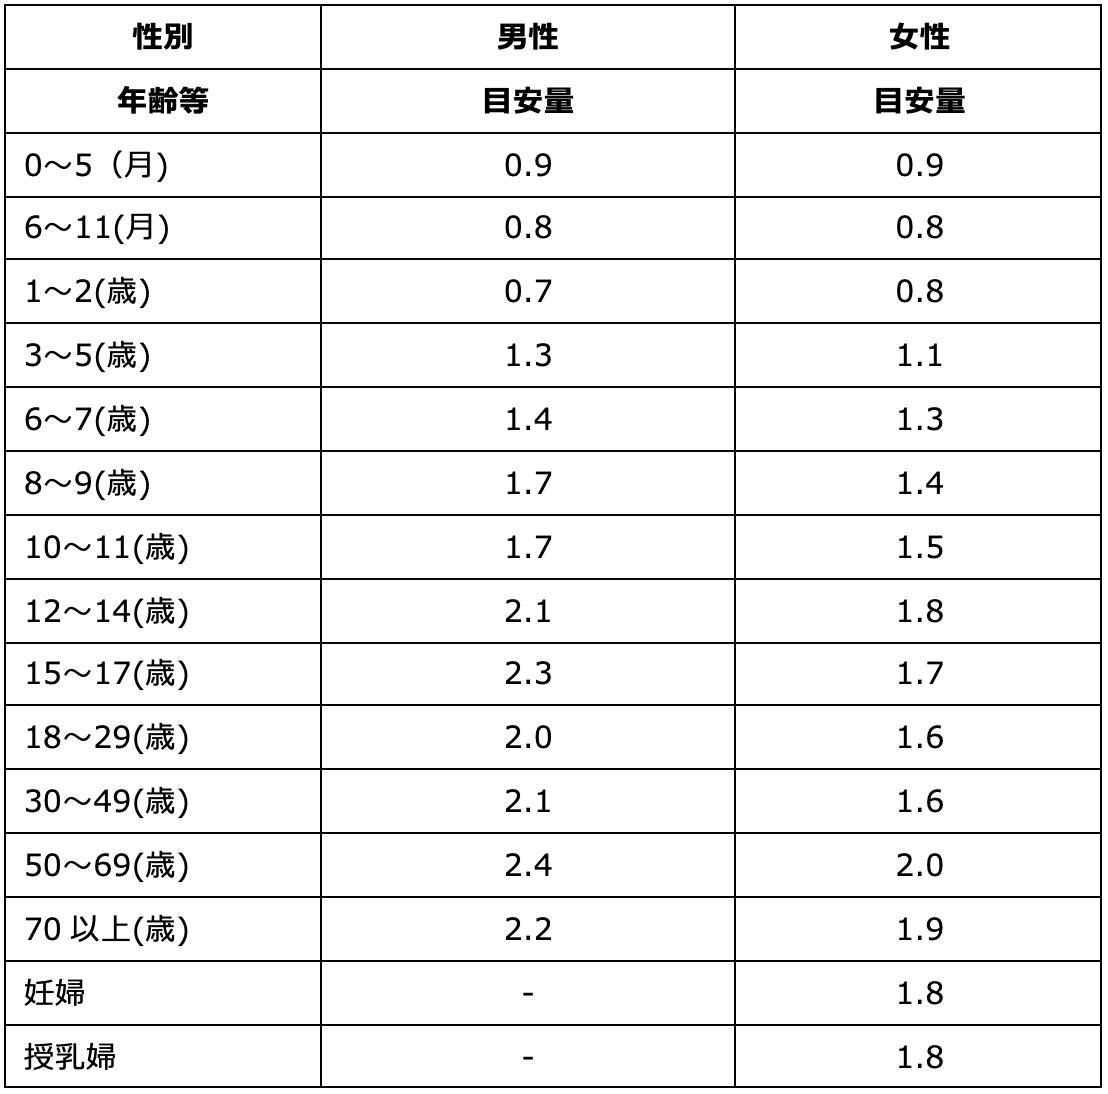 n-3 系脂肪酸の食事摂取基準(g/日)